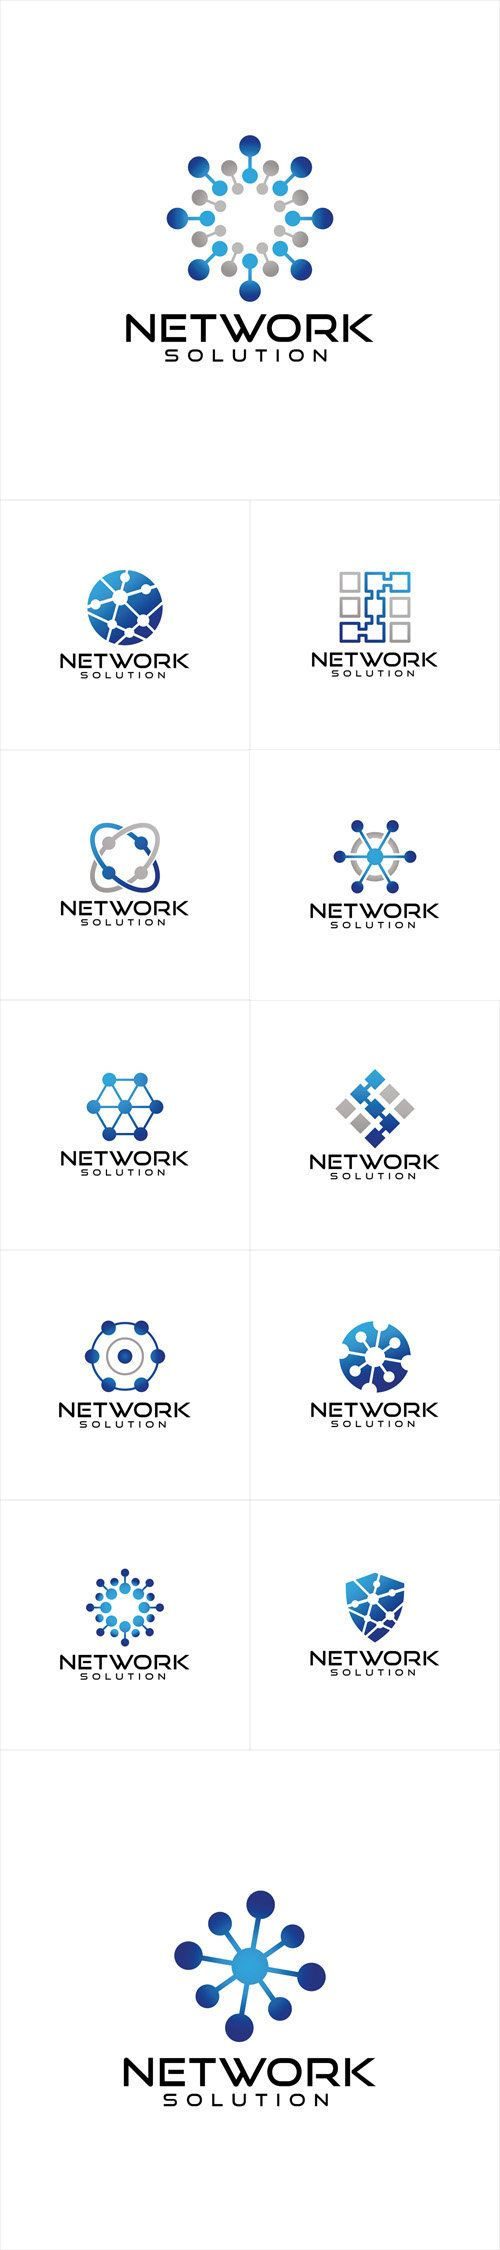 vectors network logo design logo pinterest logos logo ideas